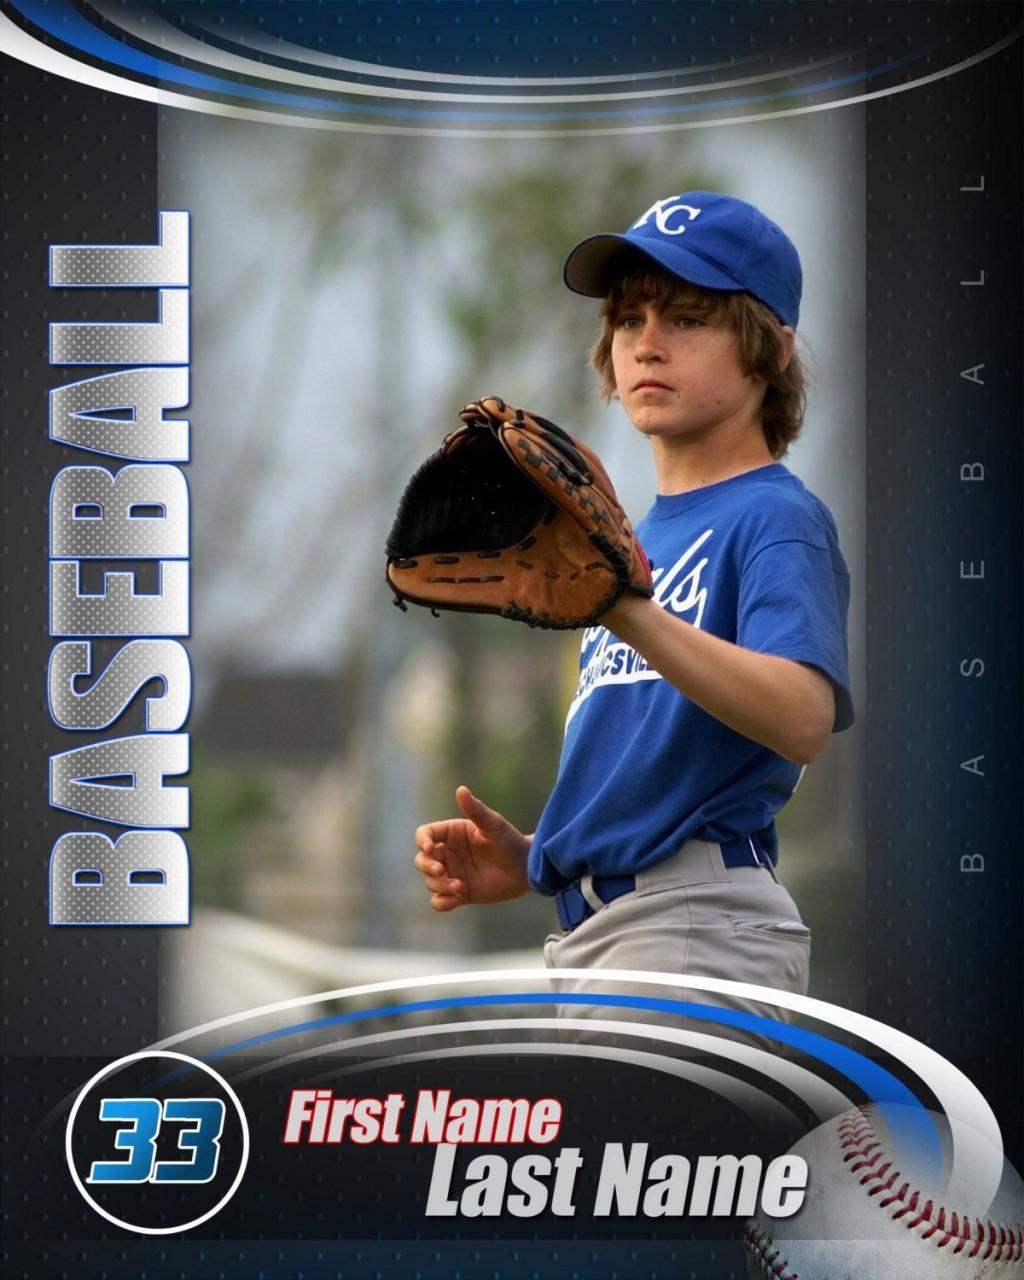 000 Imposing Baseball Card Template Photoshop Concept  Topp FreeLarge